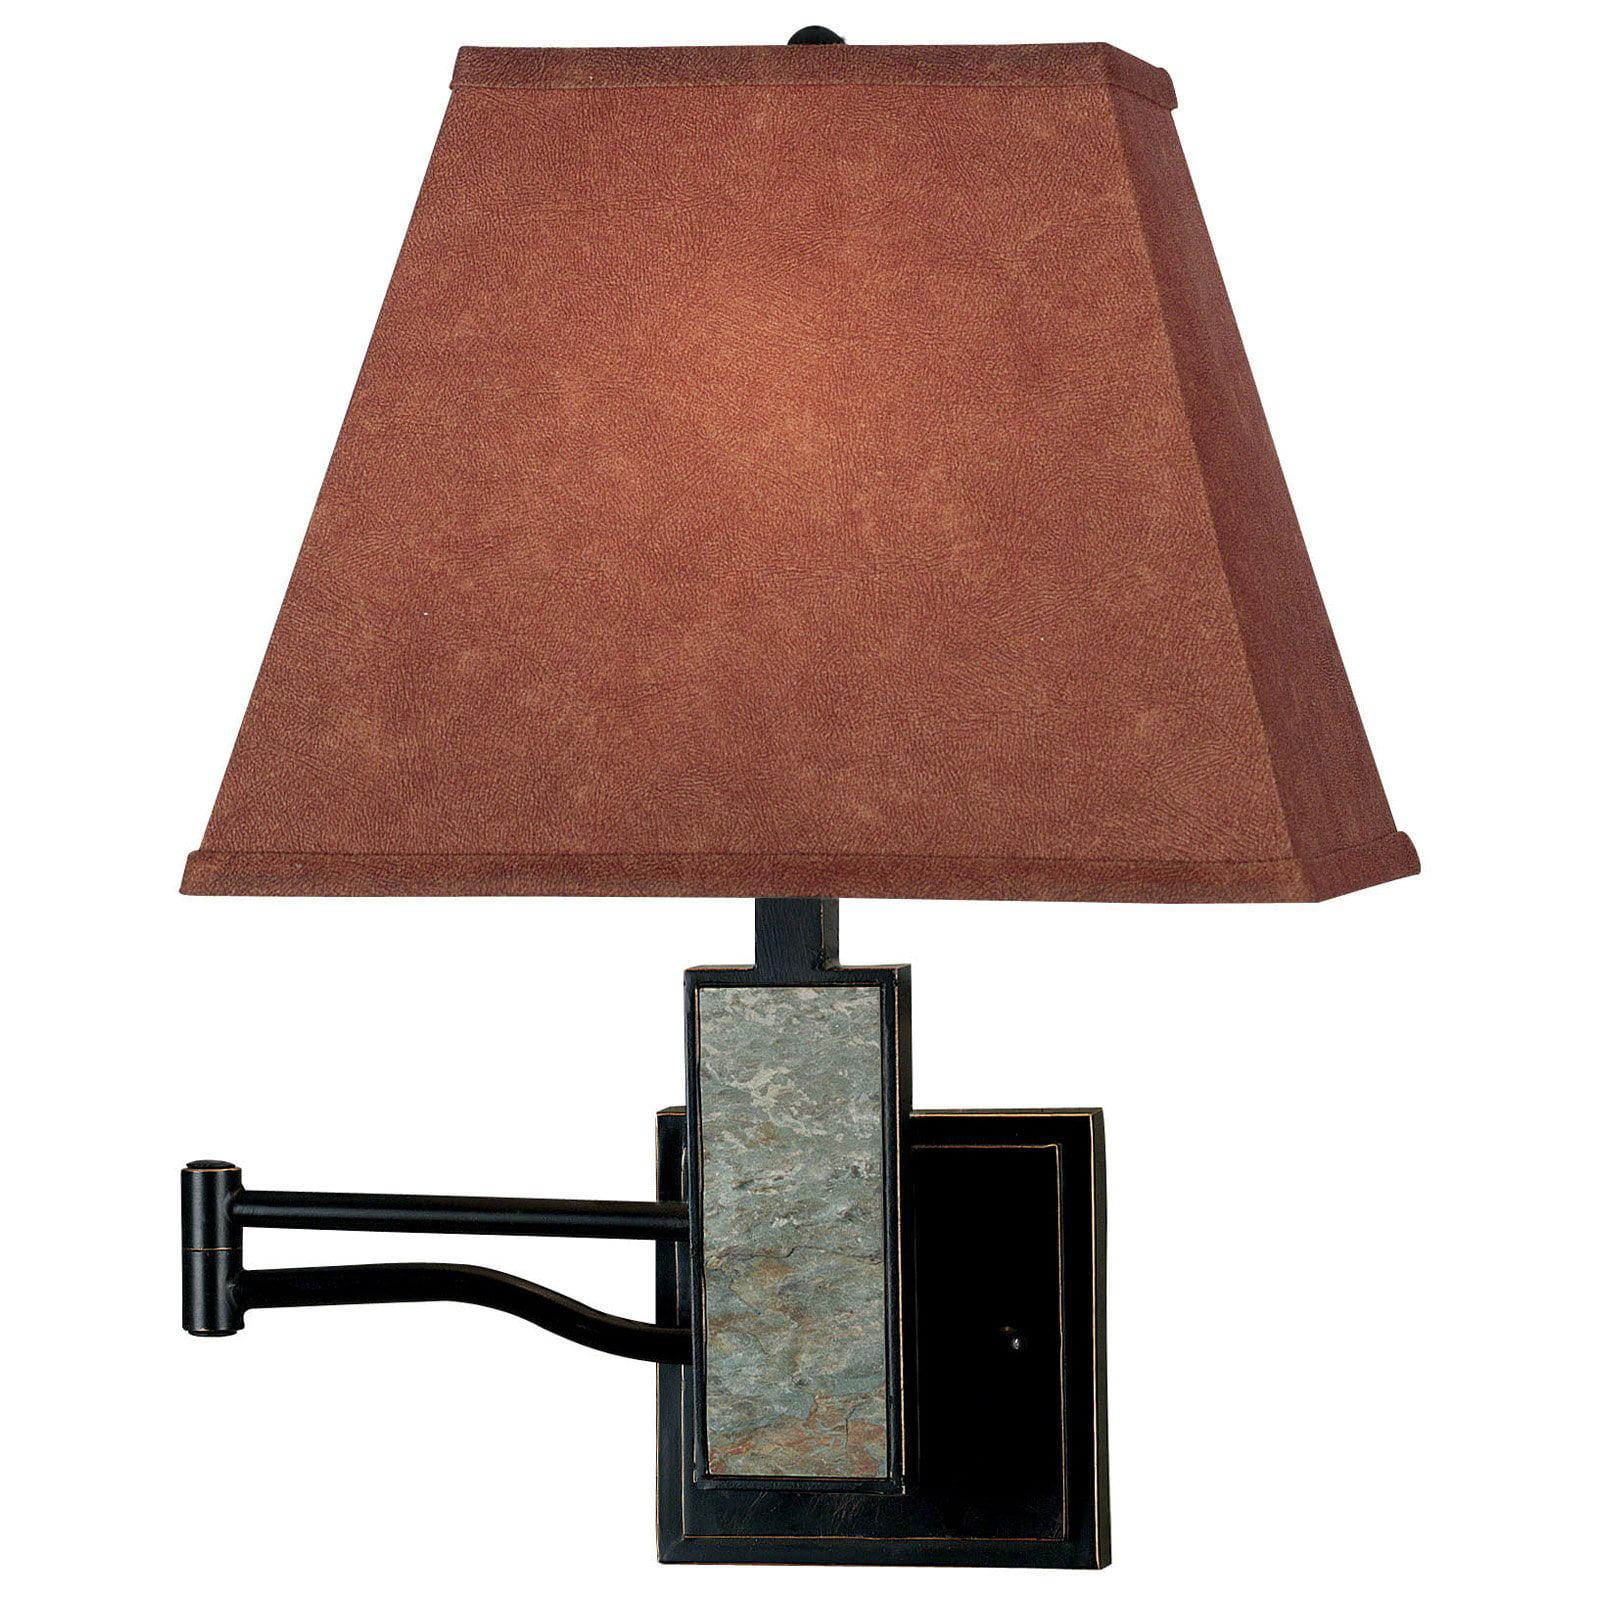 Kenroy Home Dakota Wall Swing Arm Lamp 20H in. Oil Rubbed Bronze by Kenroy Home